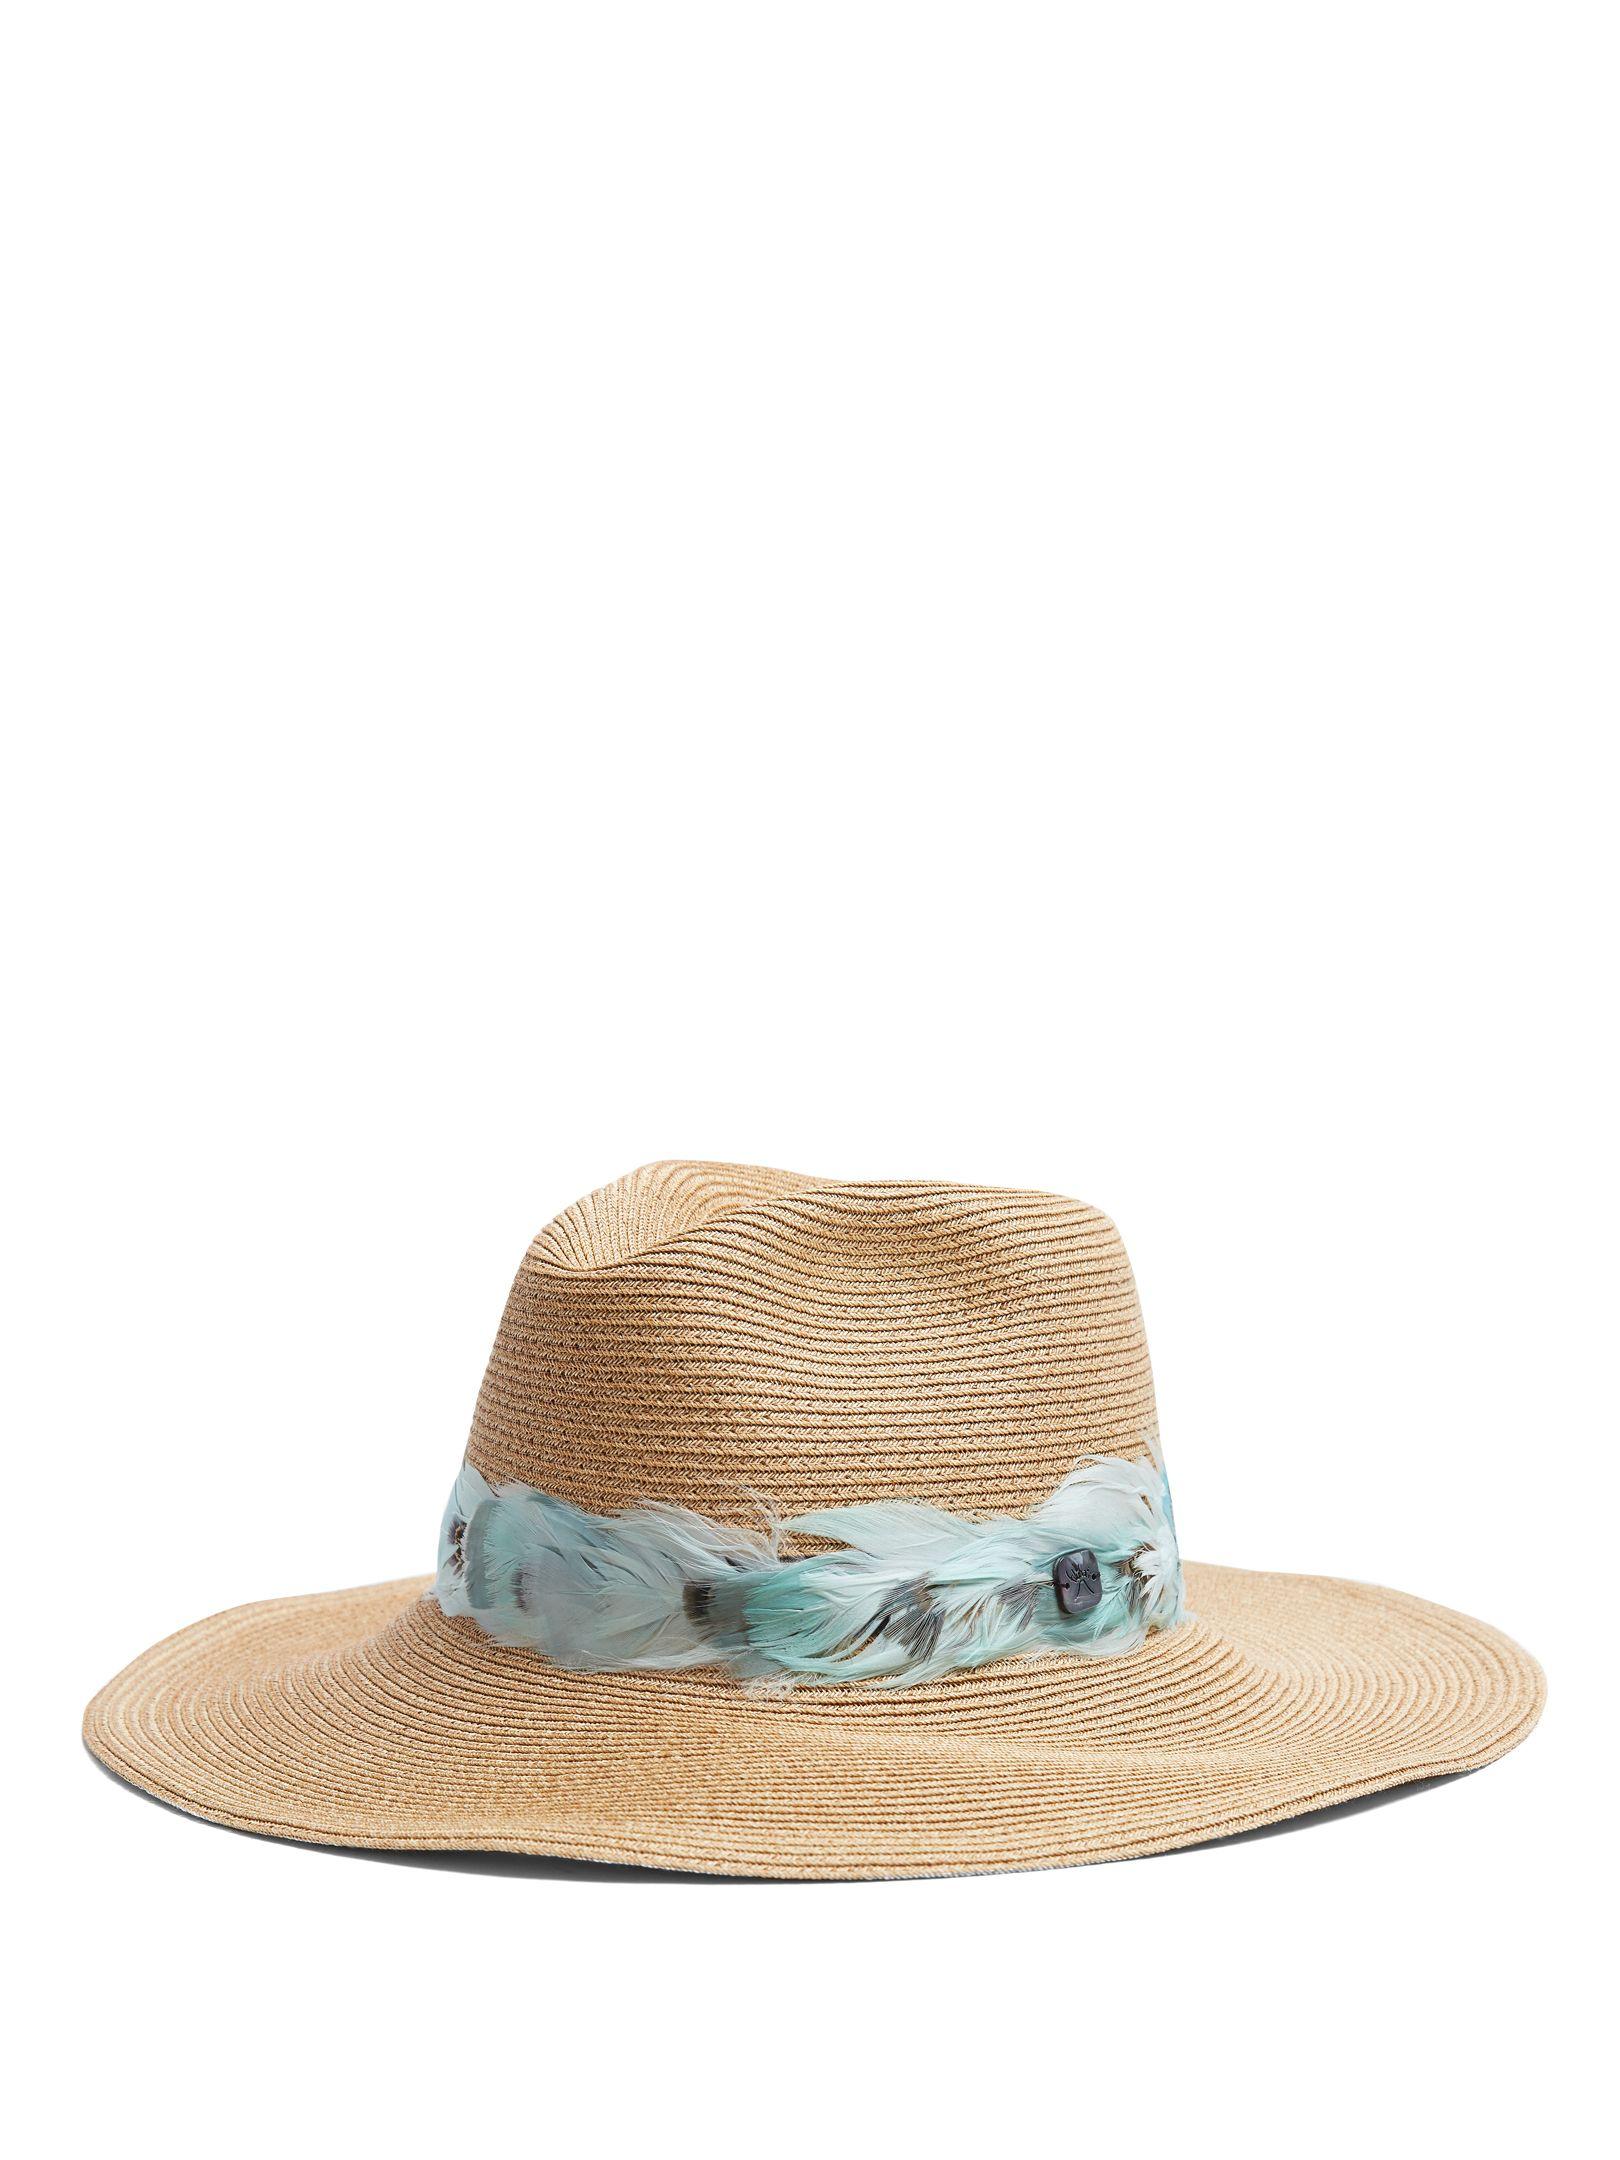 Batu Tara pompom-trimmed straw hat Fil yggkz